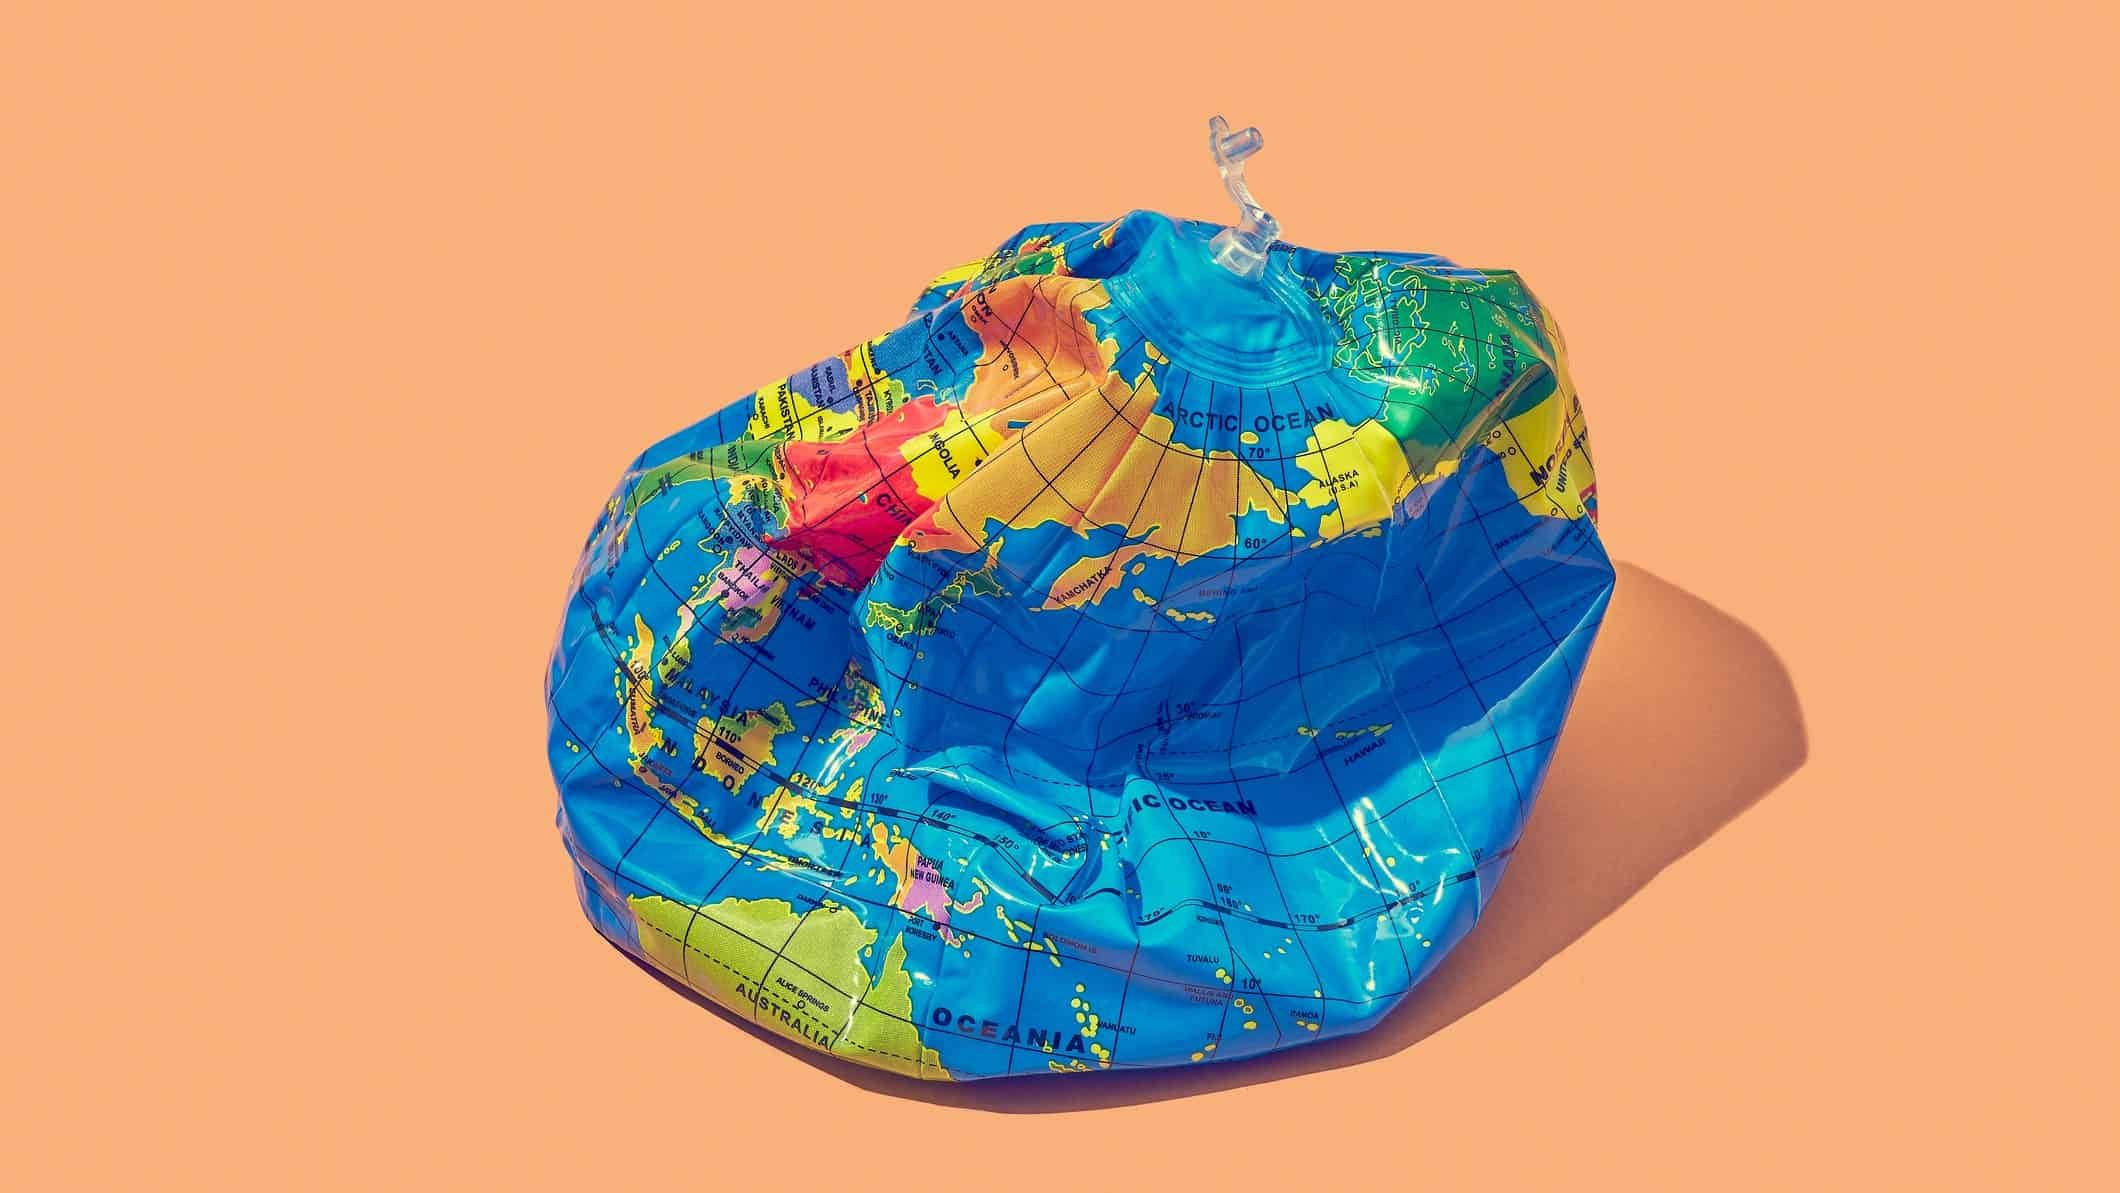 Deflated world globe on peach background to symbolise impact of climate change on the economy